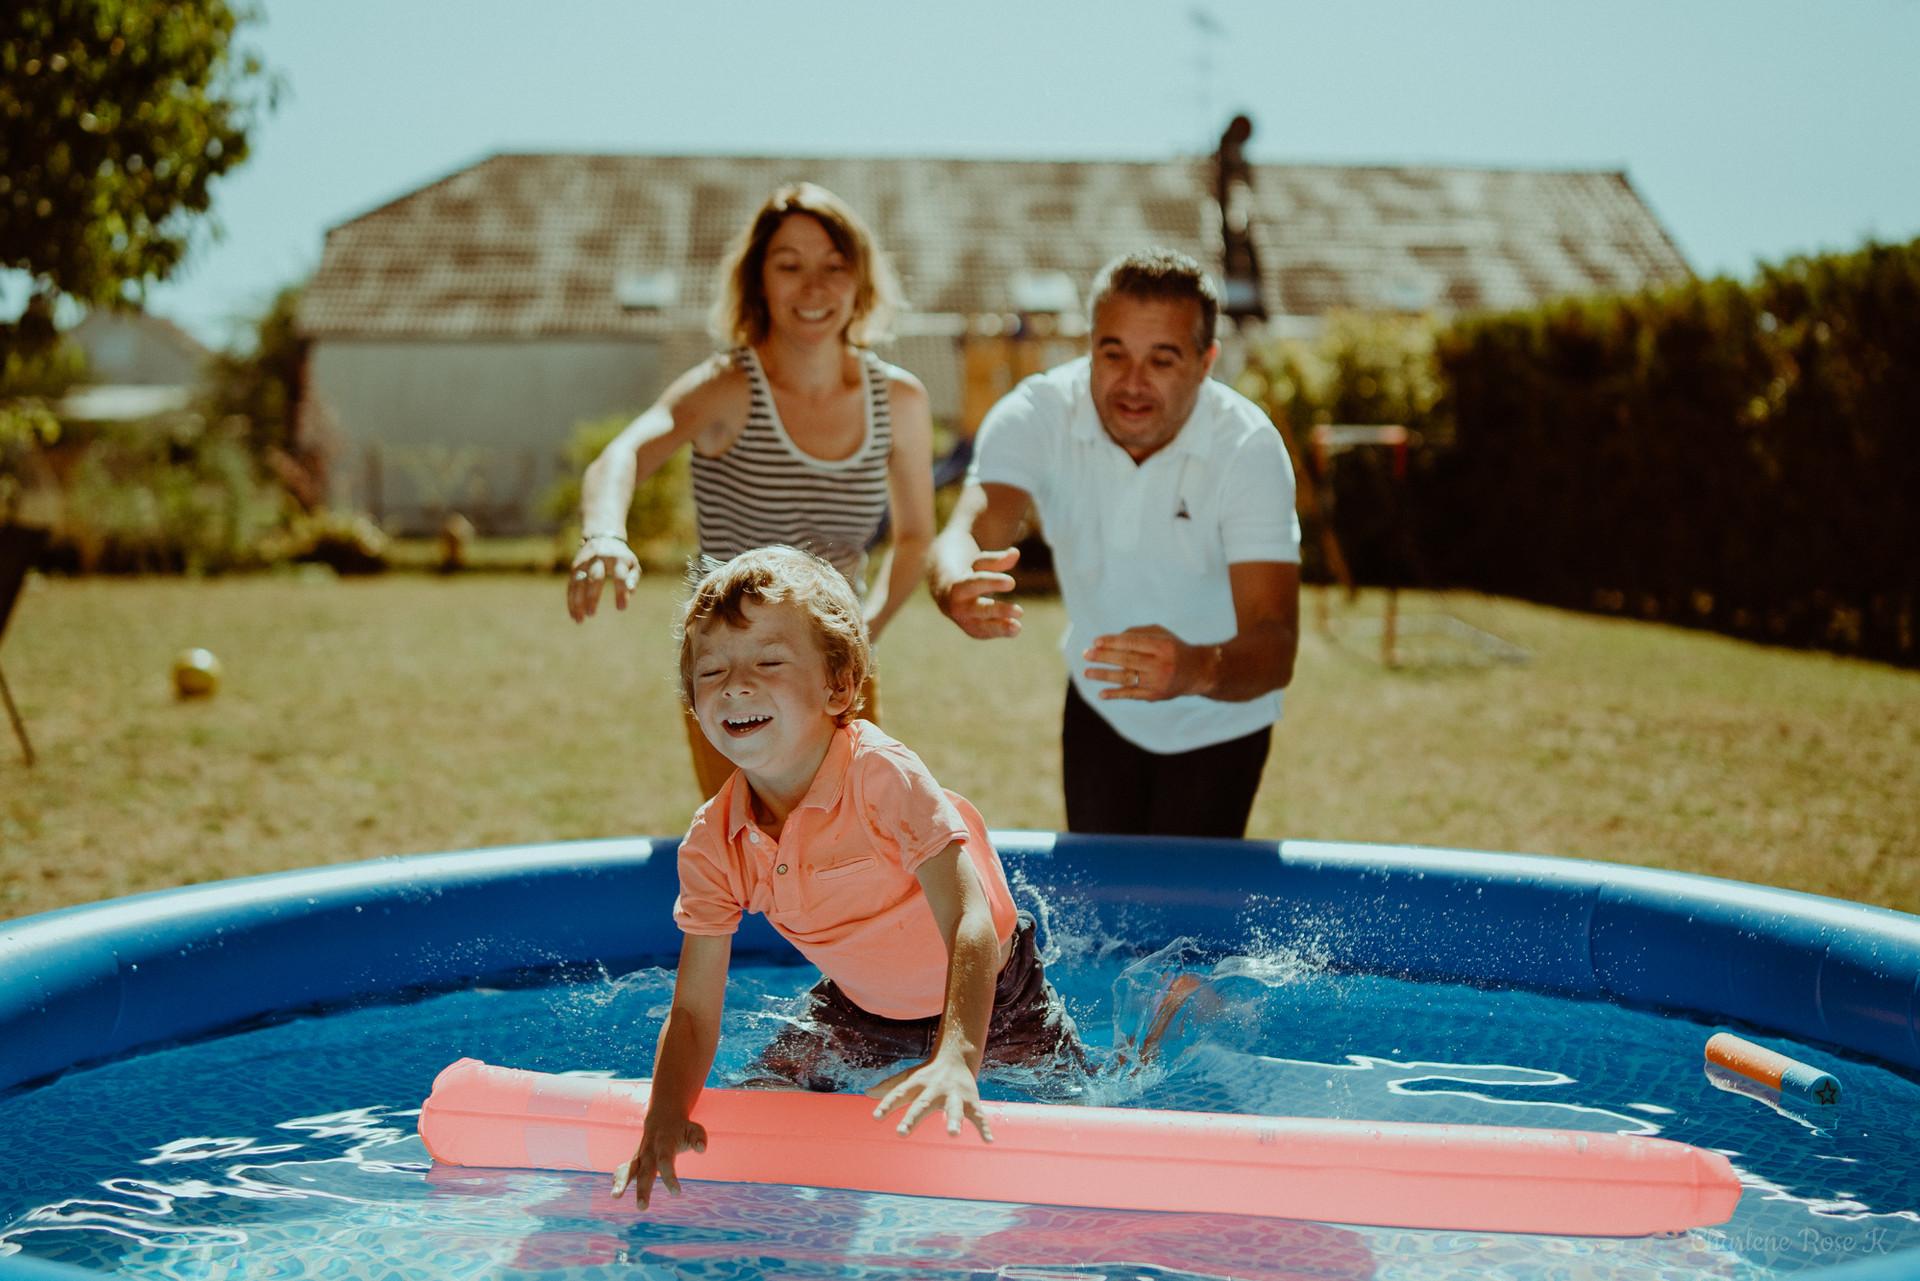 photographe-troyes-famille-enfants-domicile-crk-27